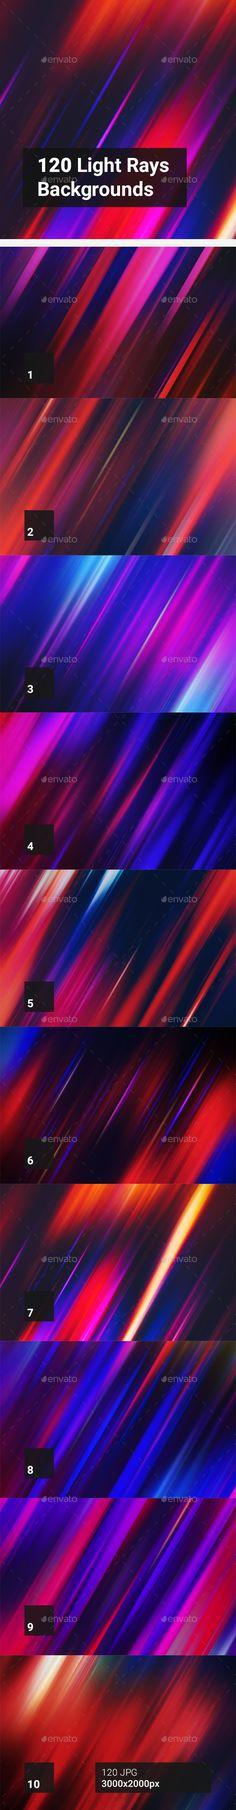 120 Light Rays Backgrounds